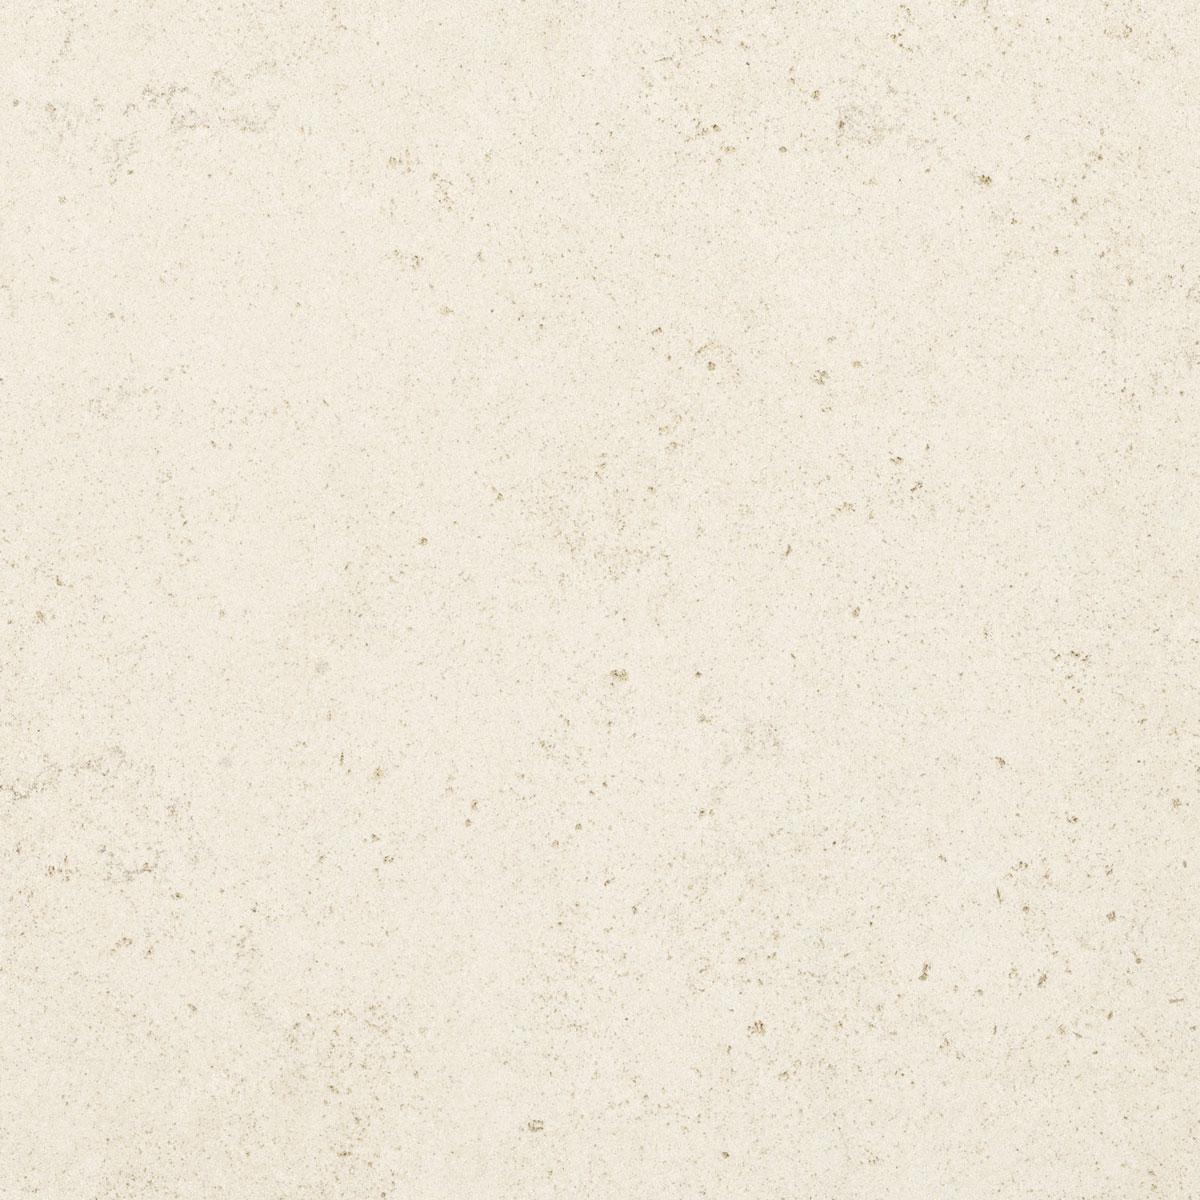 Signorino: Corail Blanc